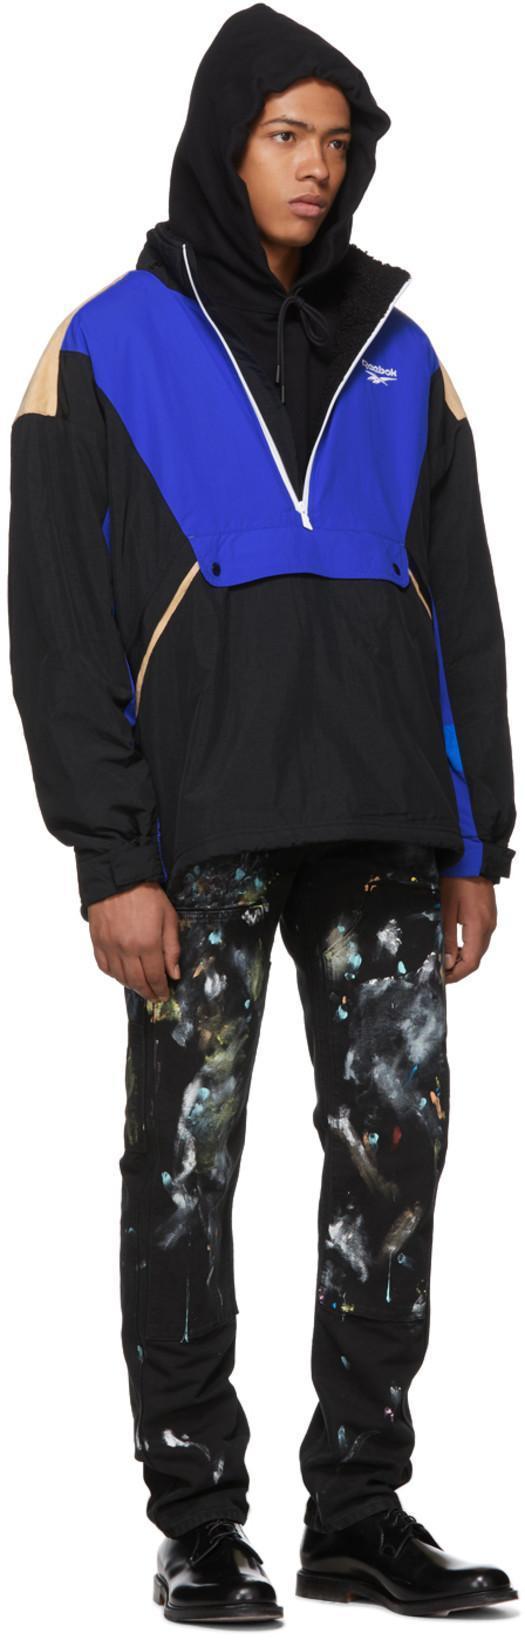 227e27e0861 Reebok Tricolor Lf Unisex Anorak Jacket